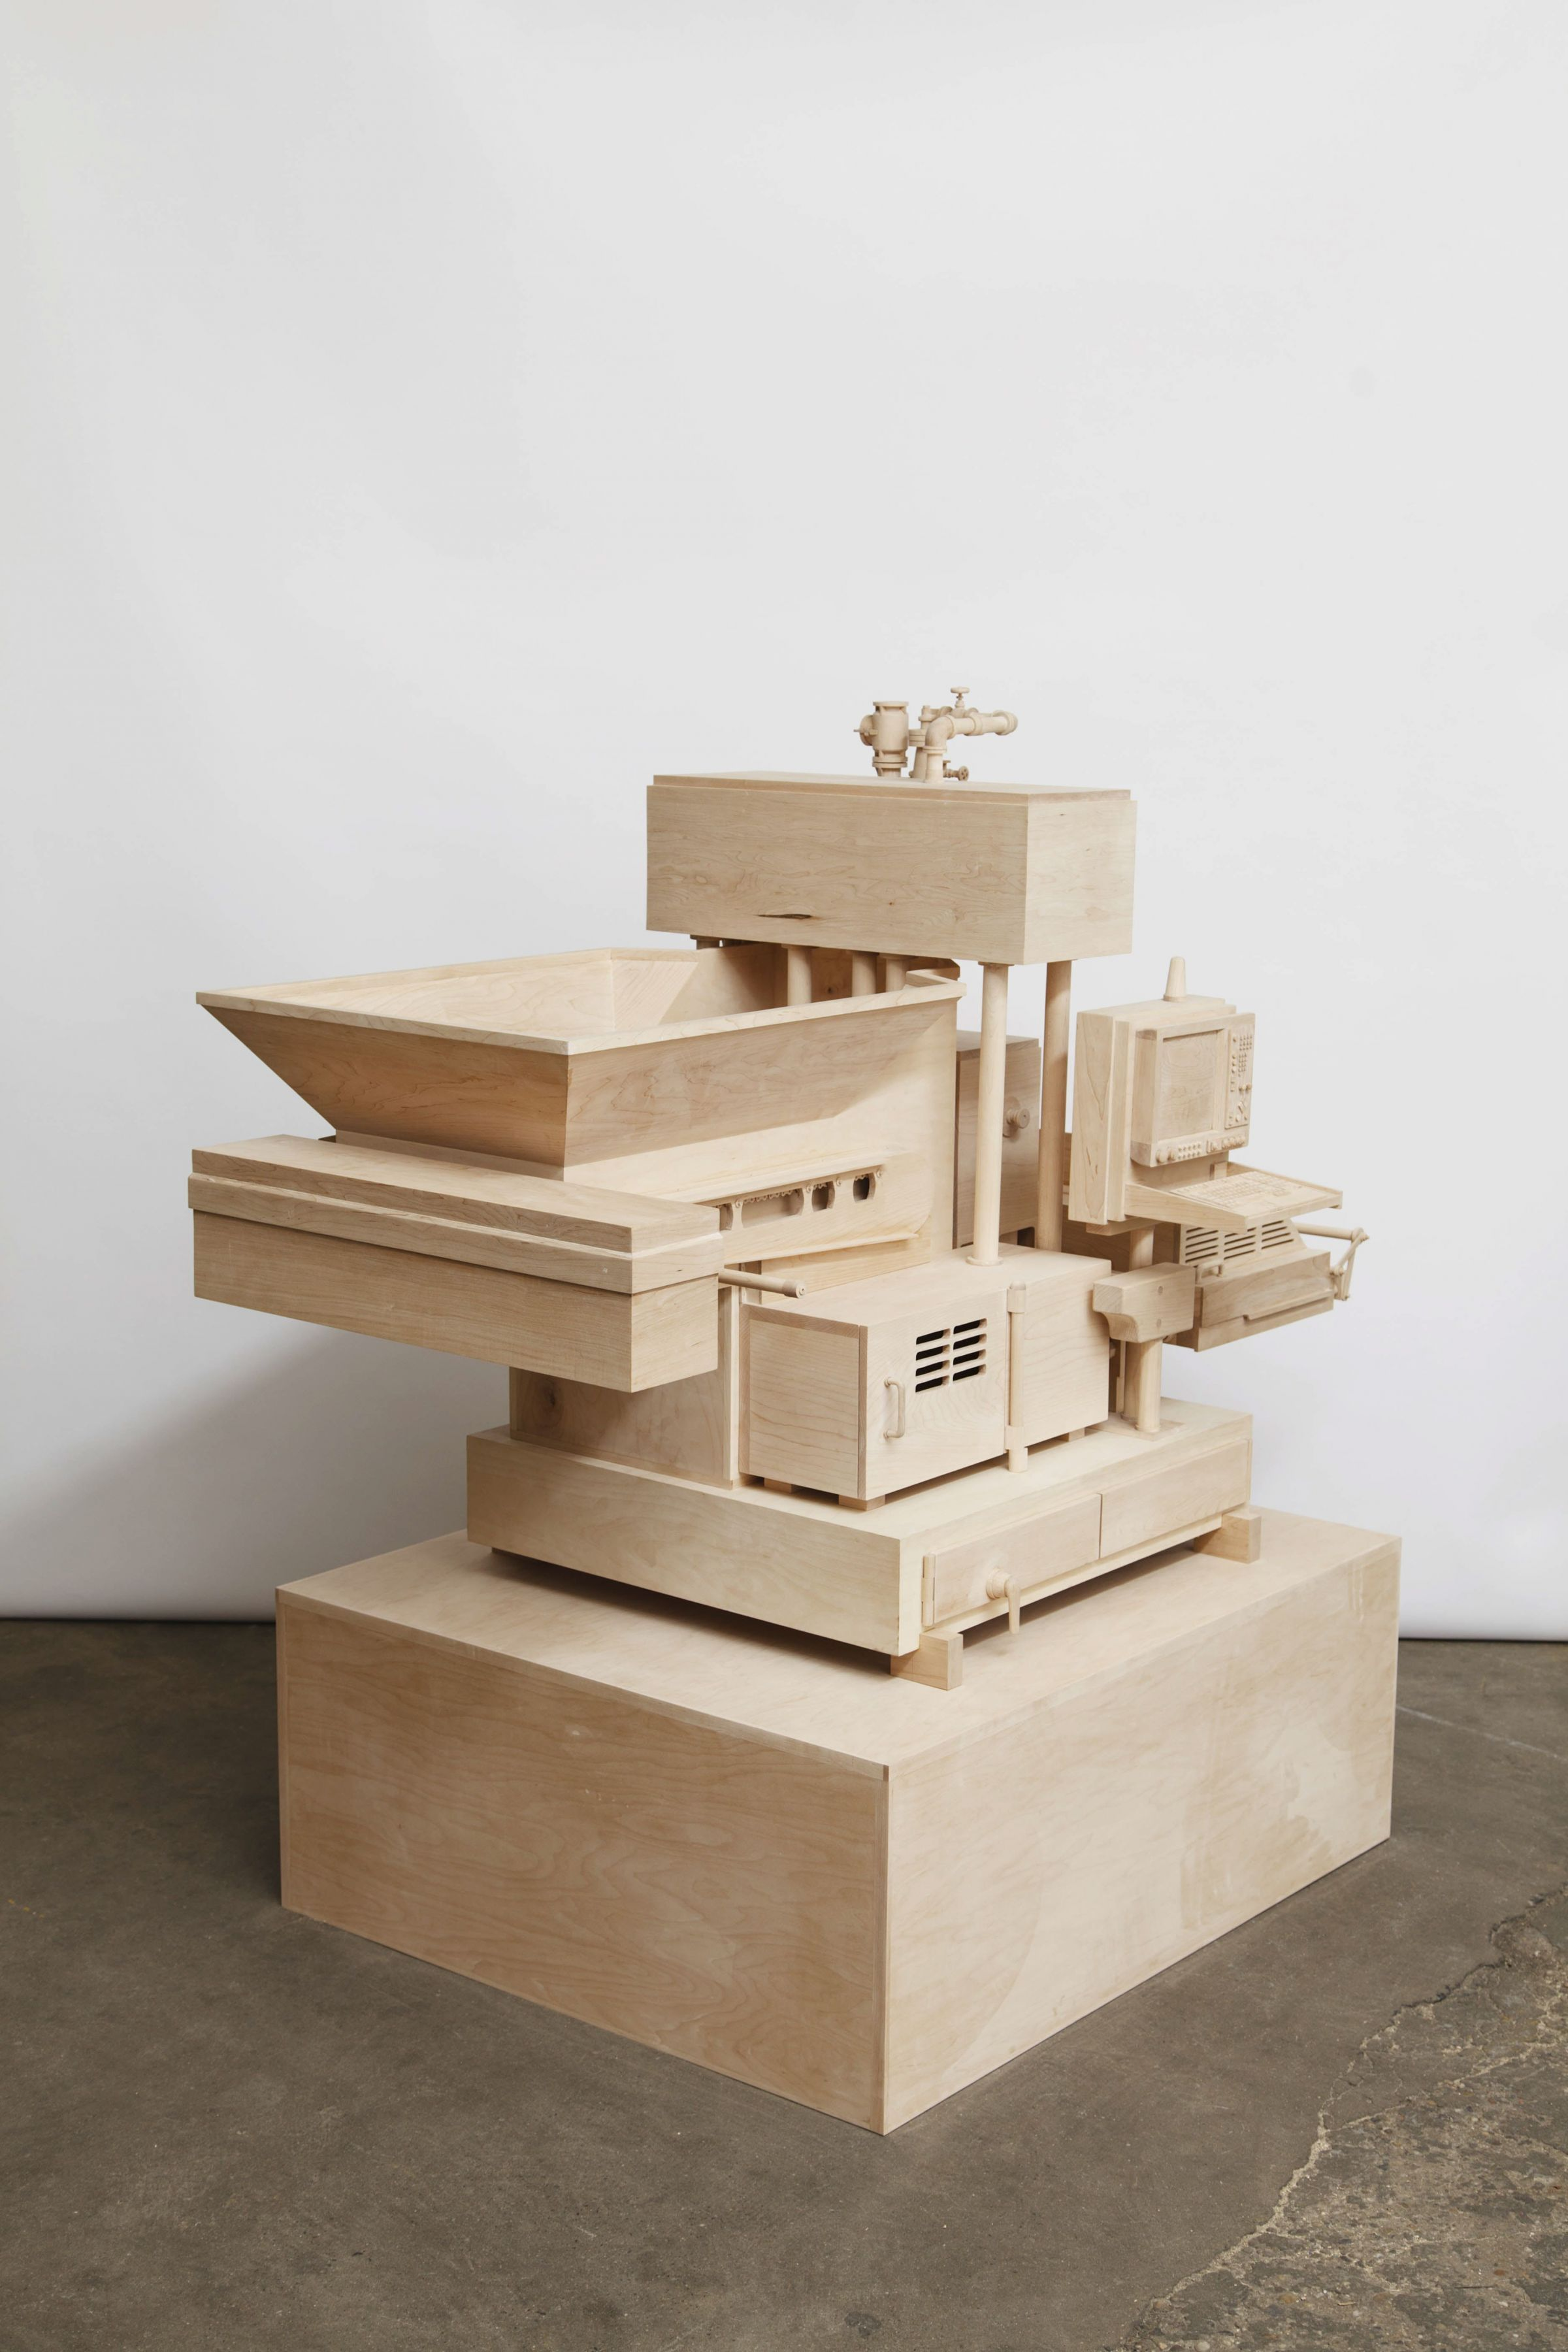 Machine of Indeterminacy, 2014, Maple